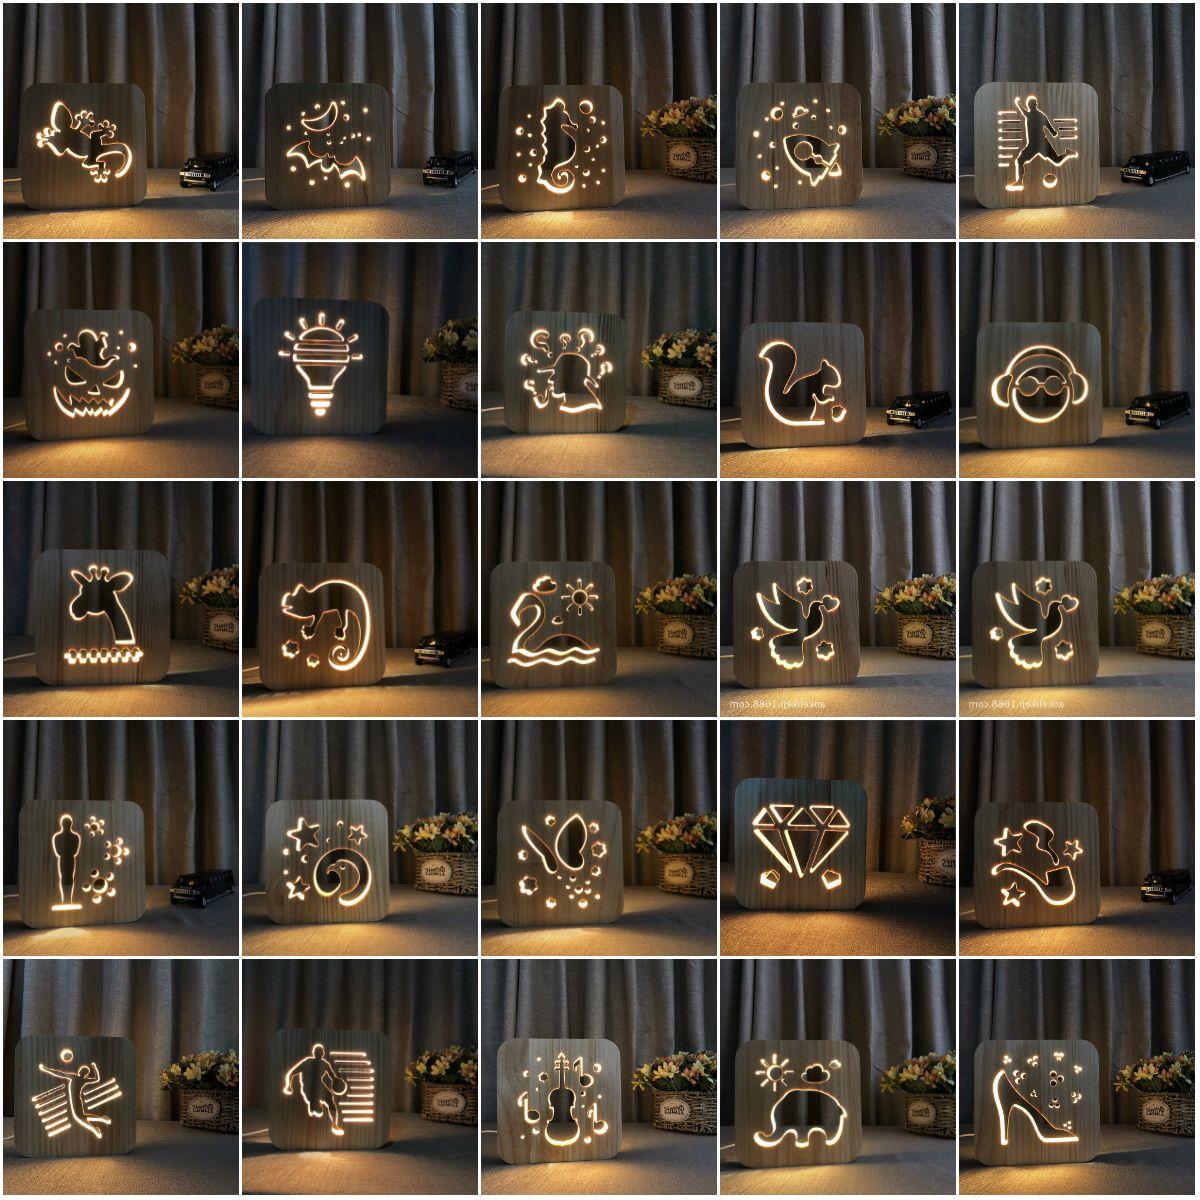 3D Lamp Panda animal Wood Carving Pattern LED Light USB Power Wooden Nightlight, LED Table Desk Home Bedroom Decoration Lamp